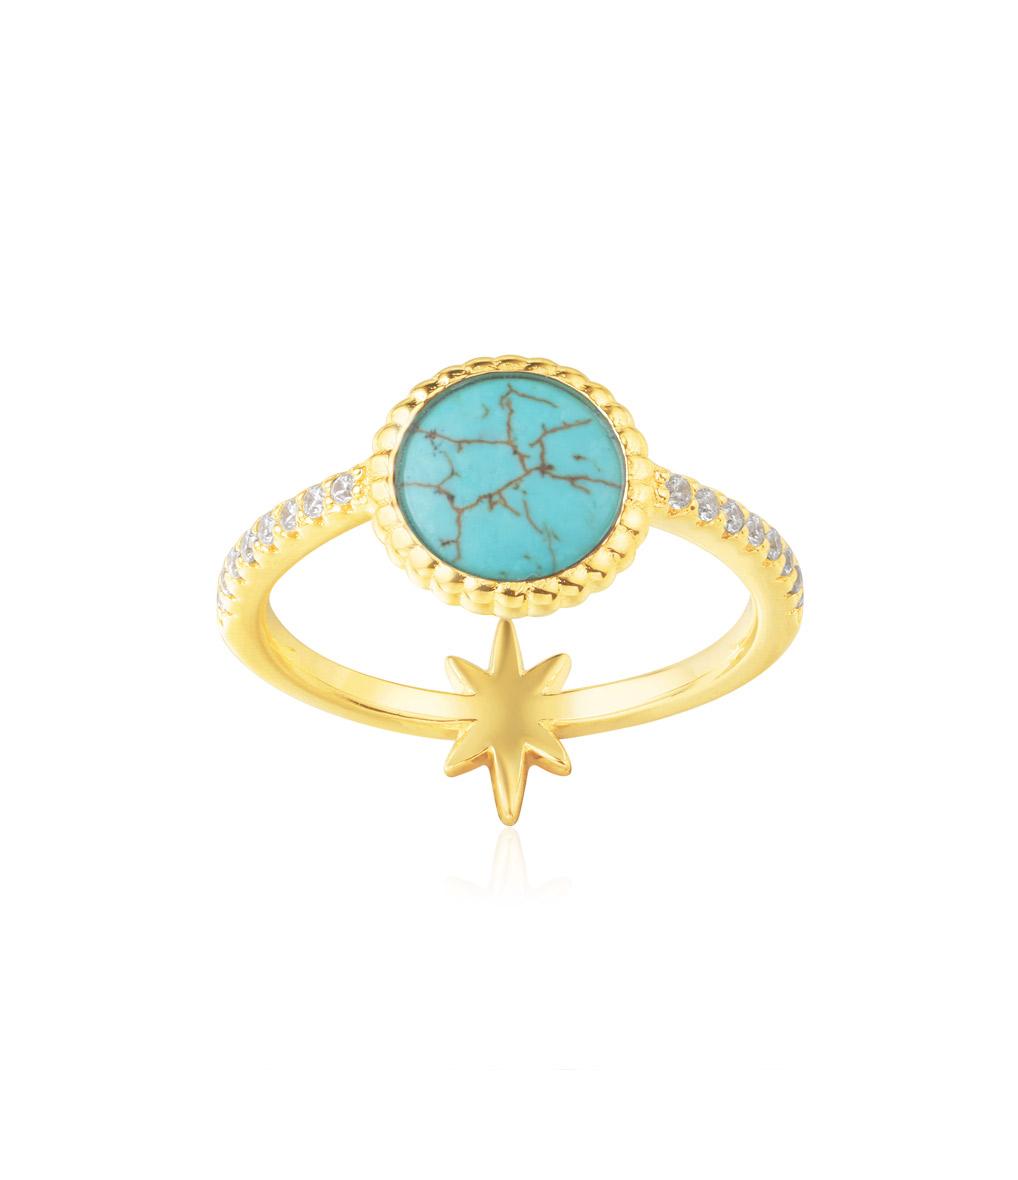 Bague Pastille Turquoise Valentine